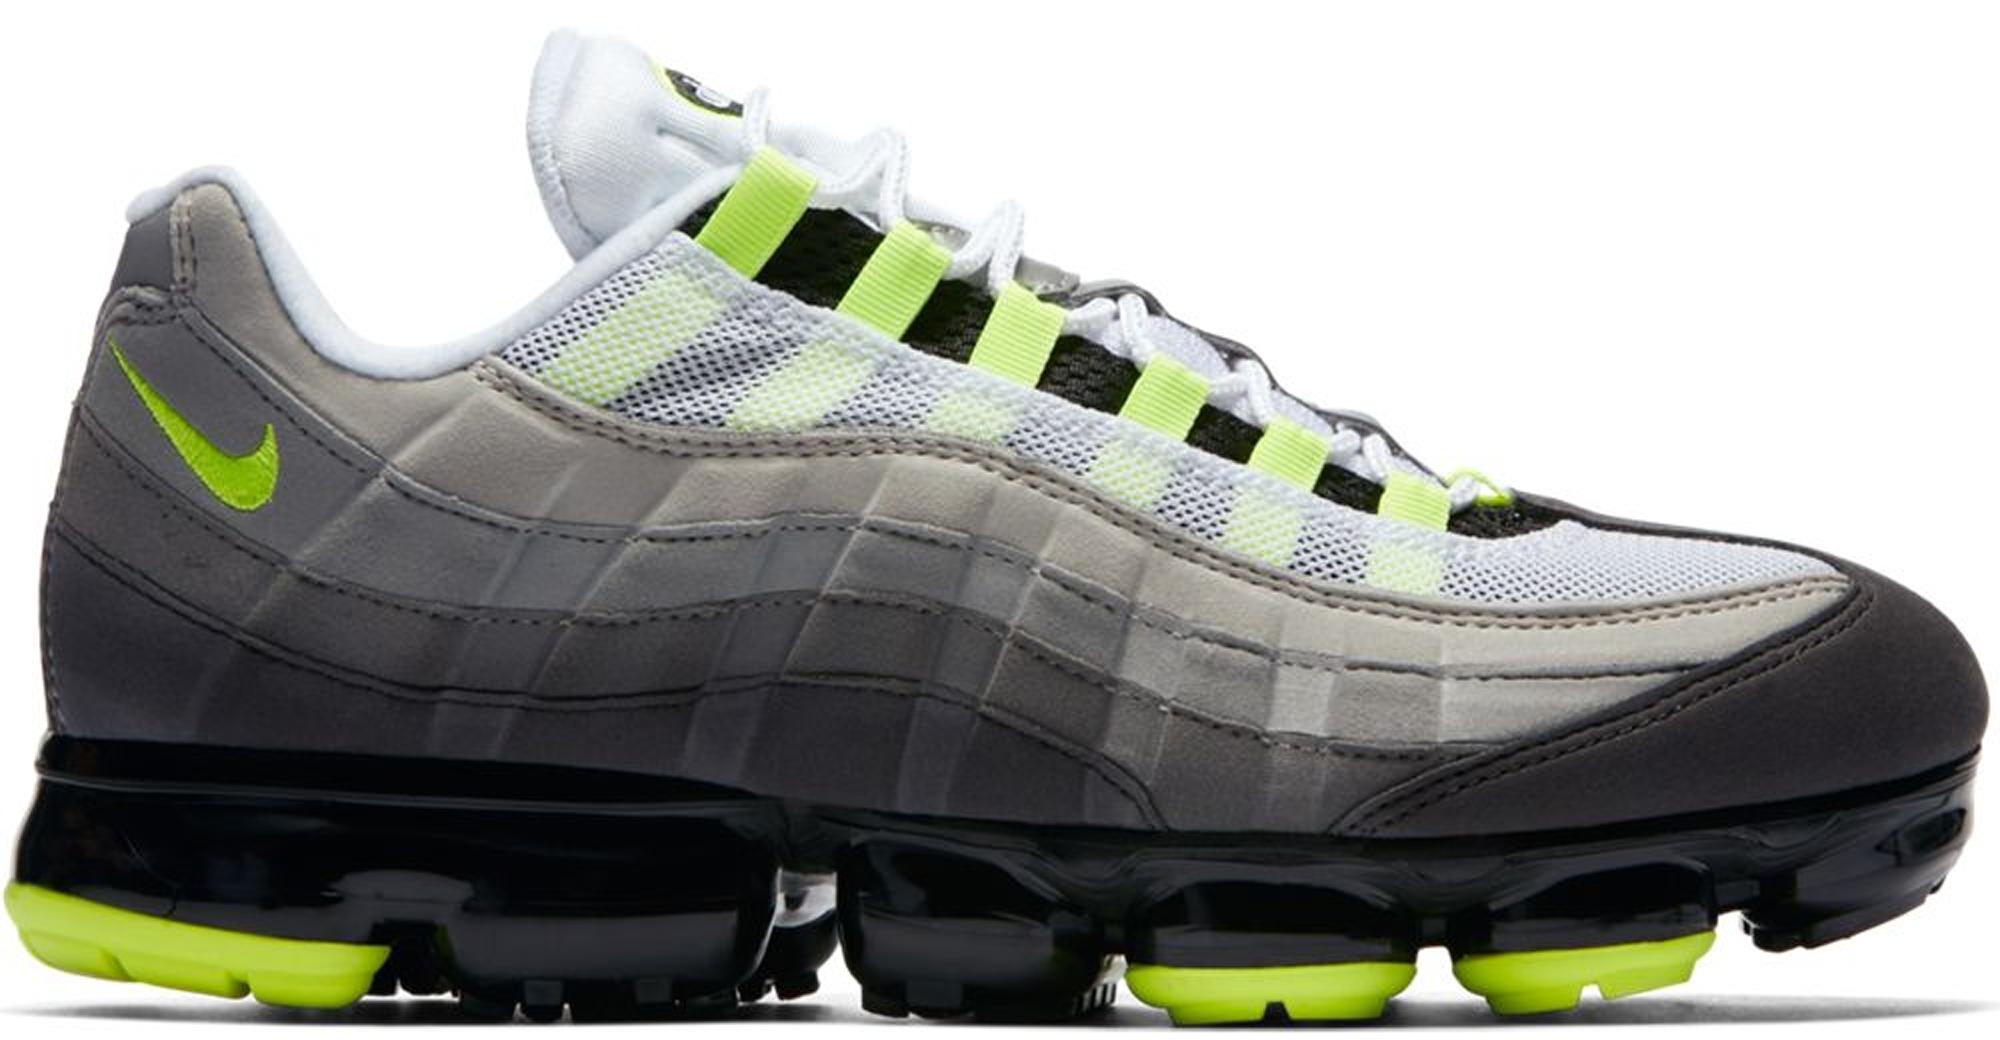 Nike Air VaporMax 95 Neon - StockX News